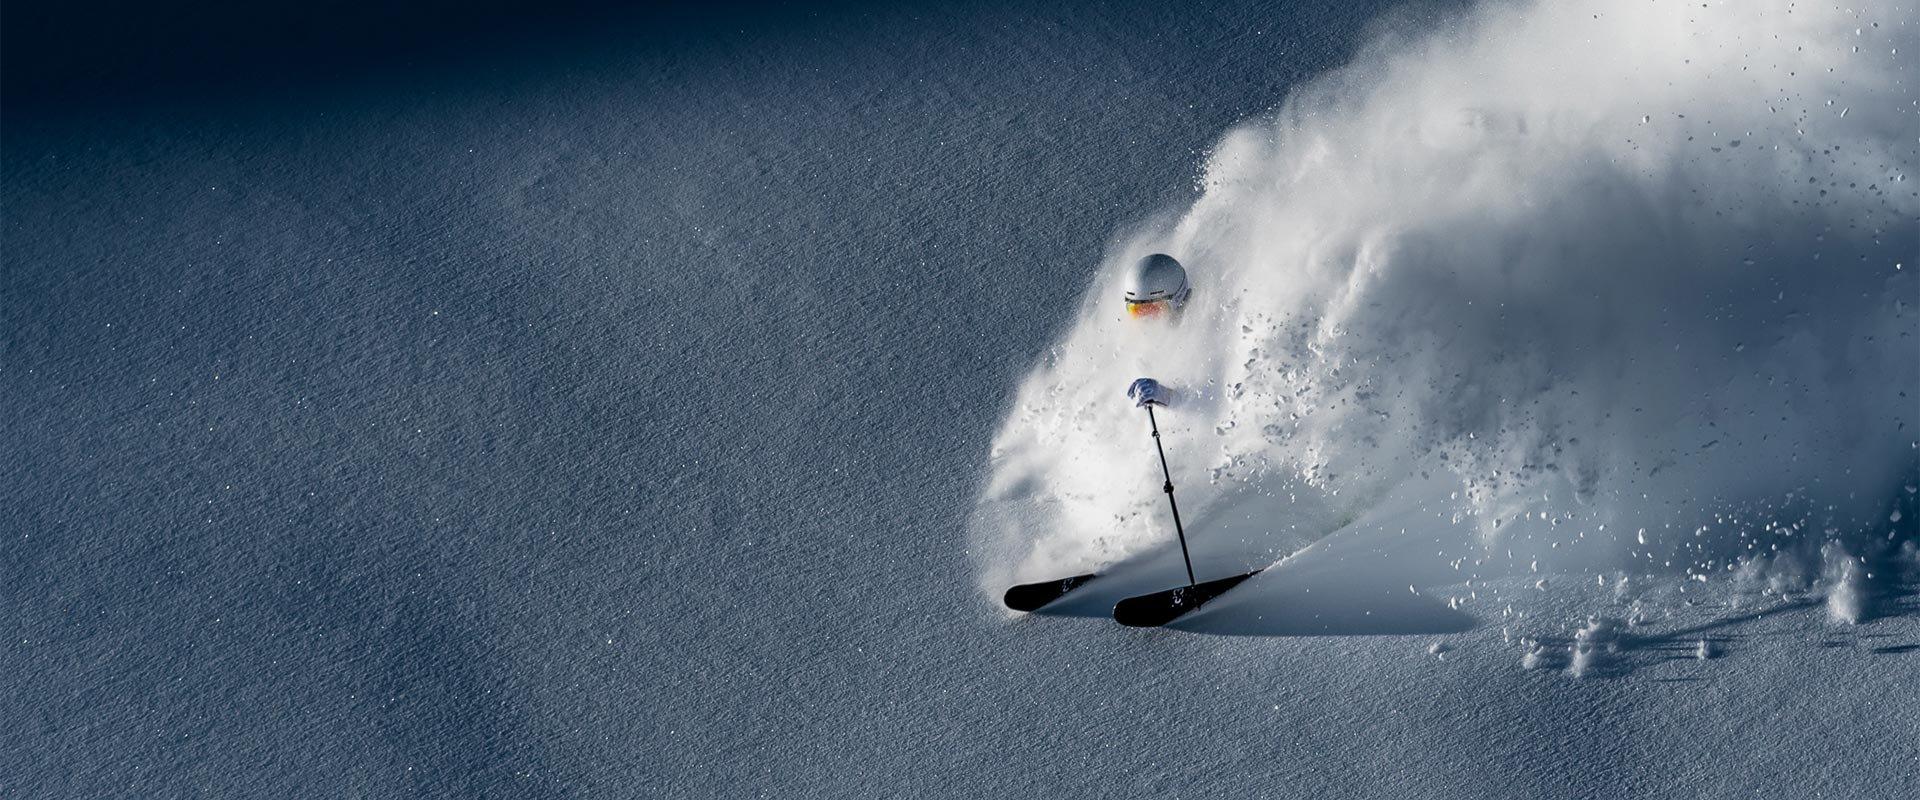 vimff ubc ski show title bg